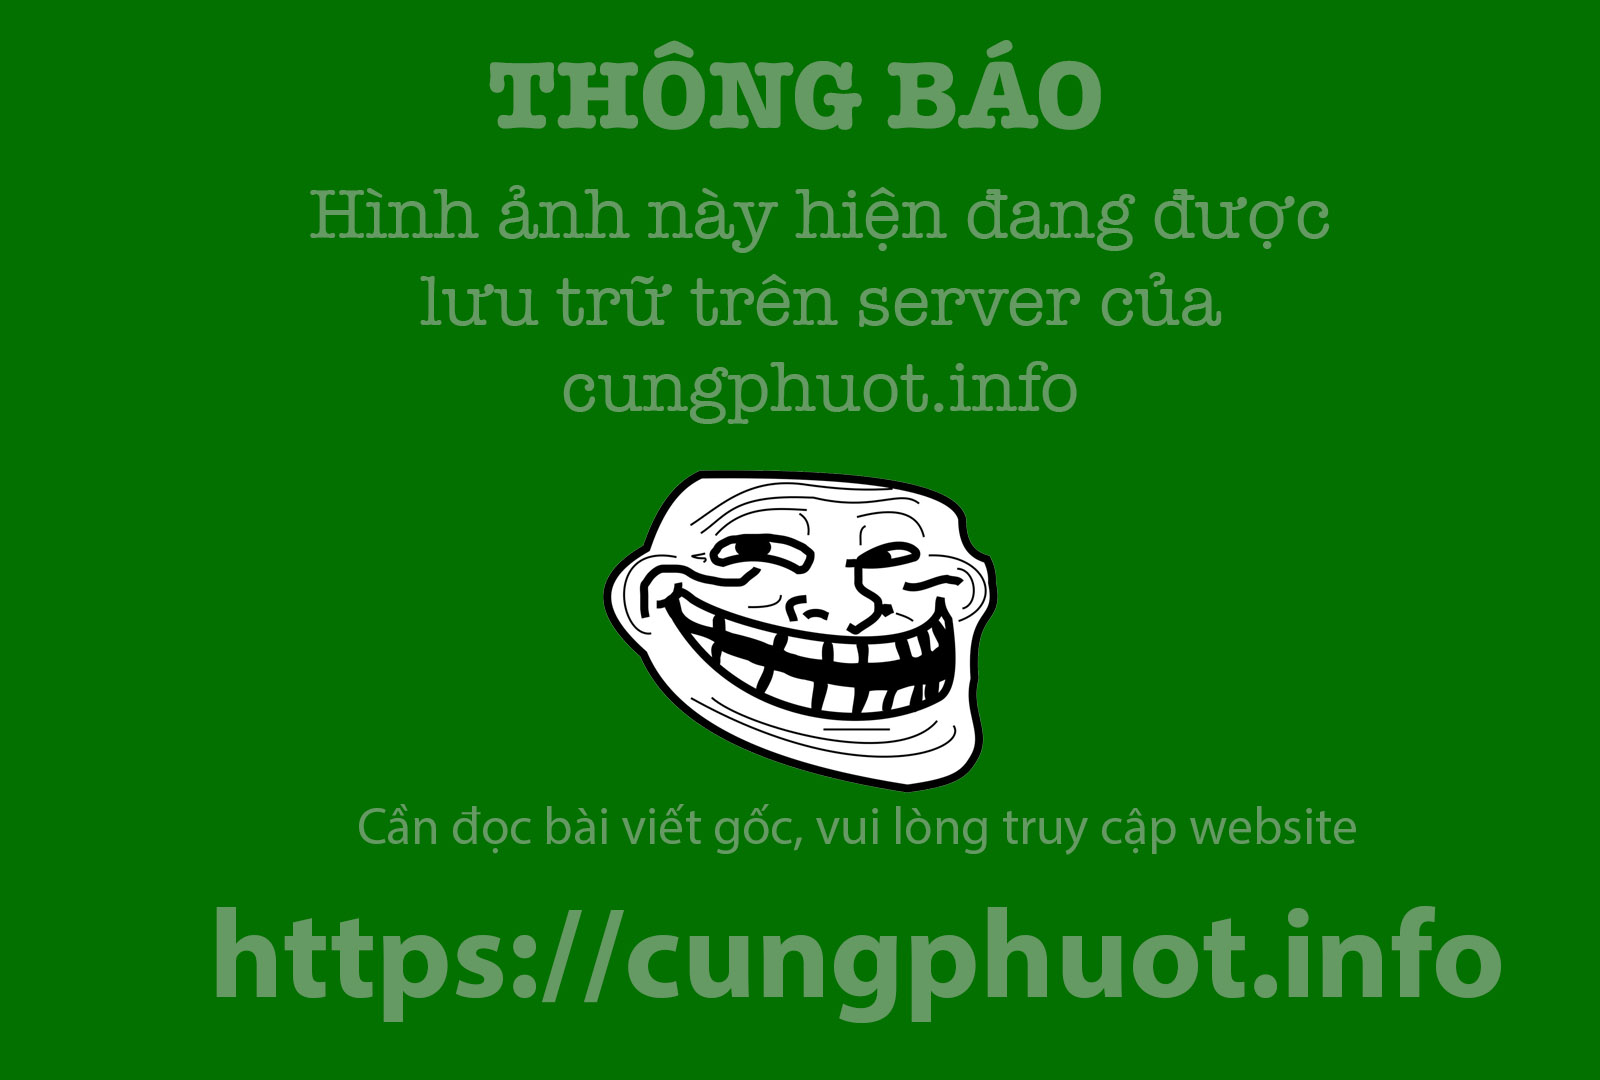 Den Moc Chau san mai anh dao hinh anh 14